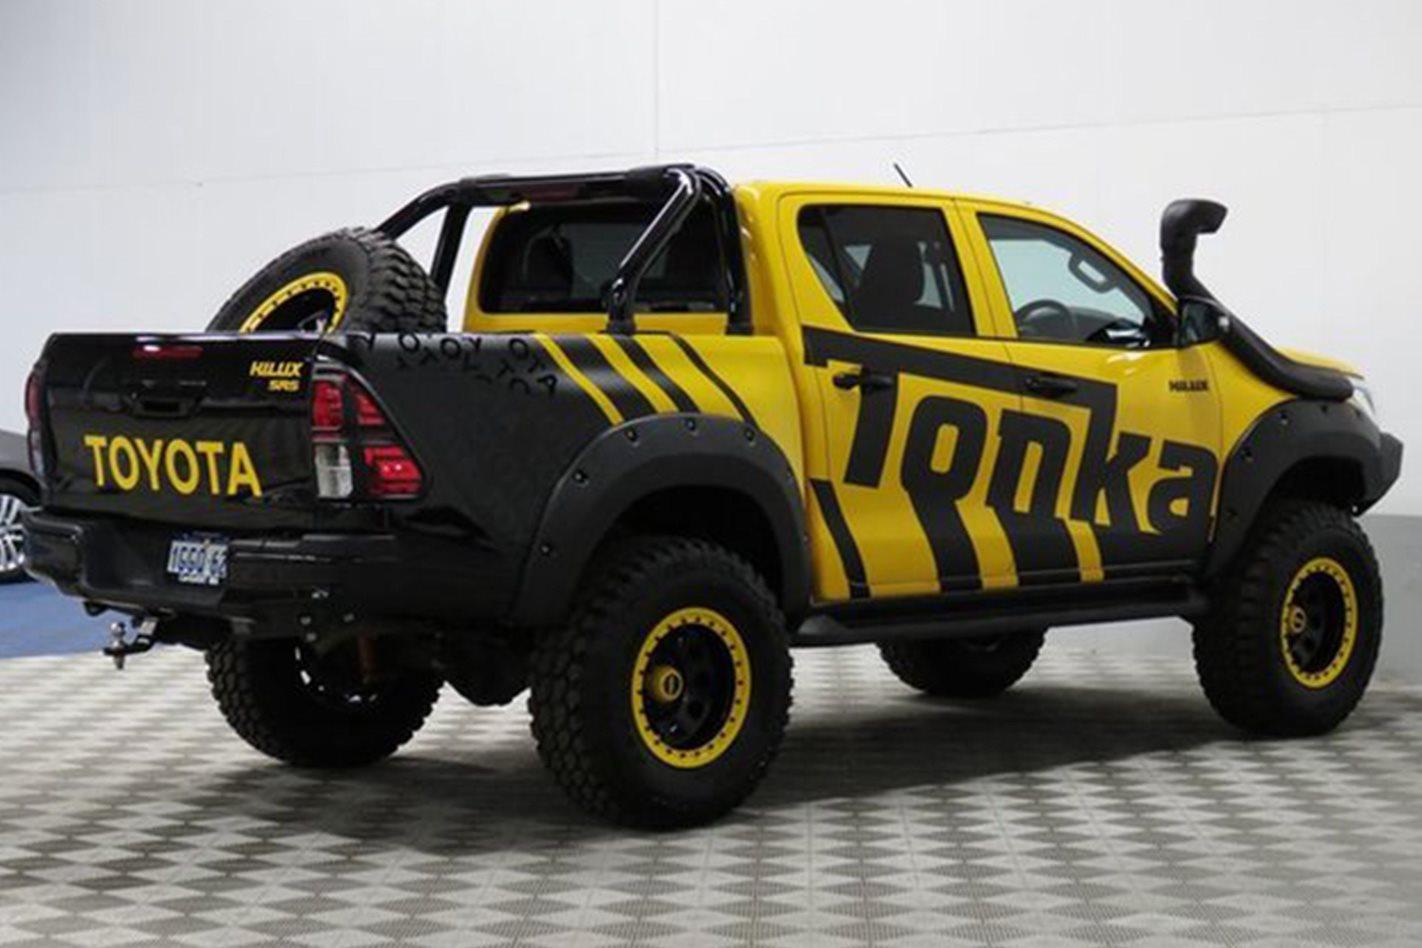 Toyota Hilux Tonka Concept side profile